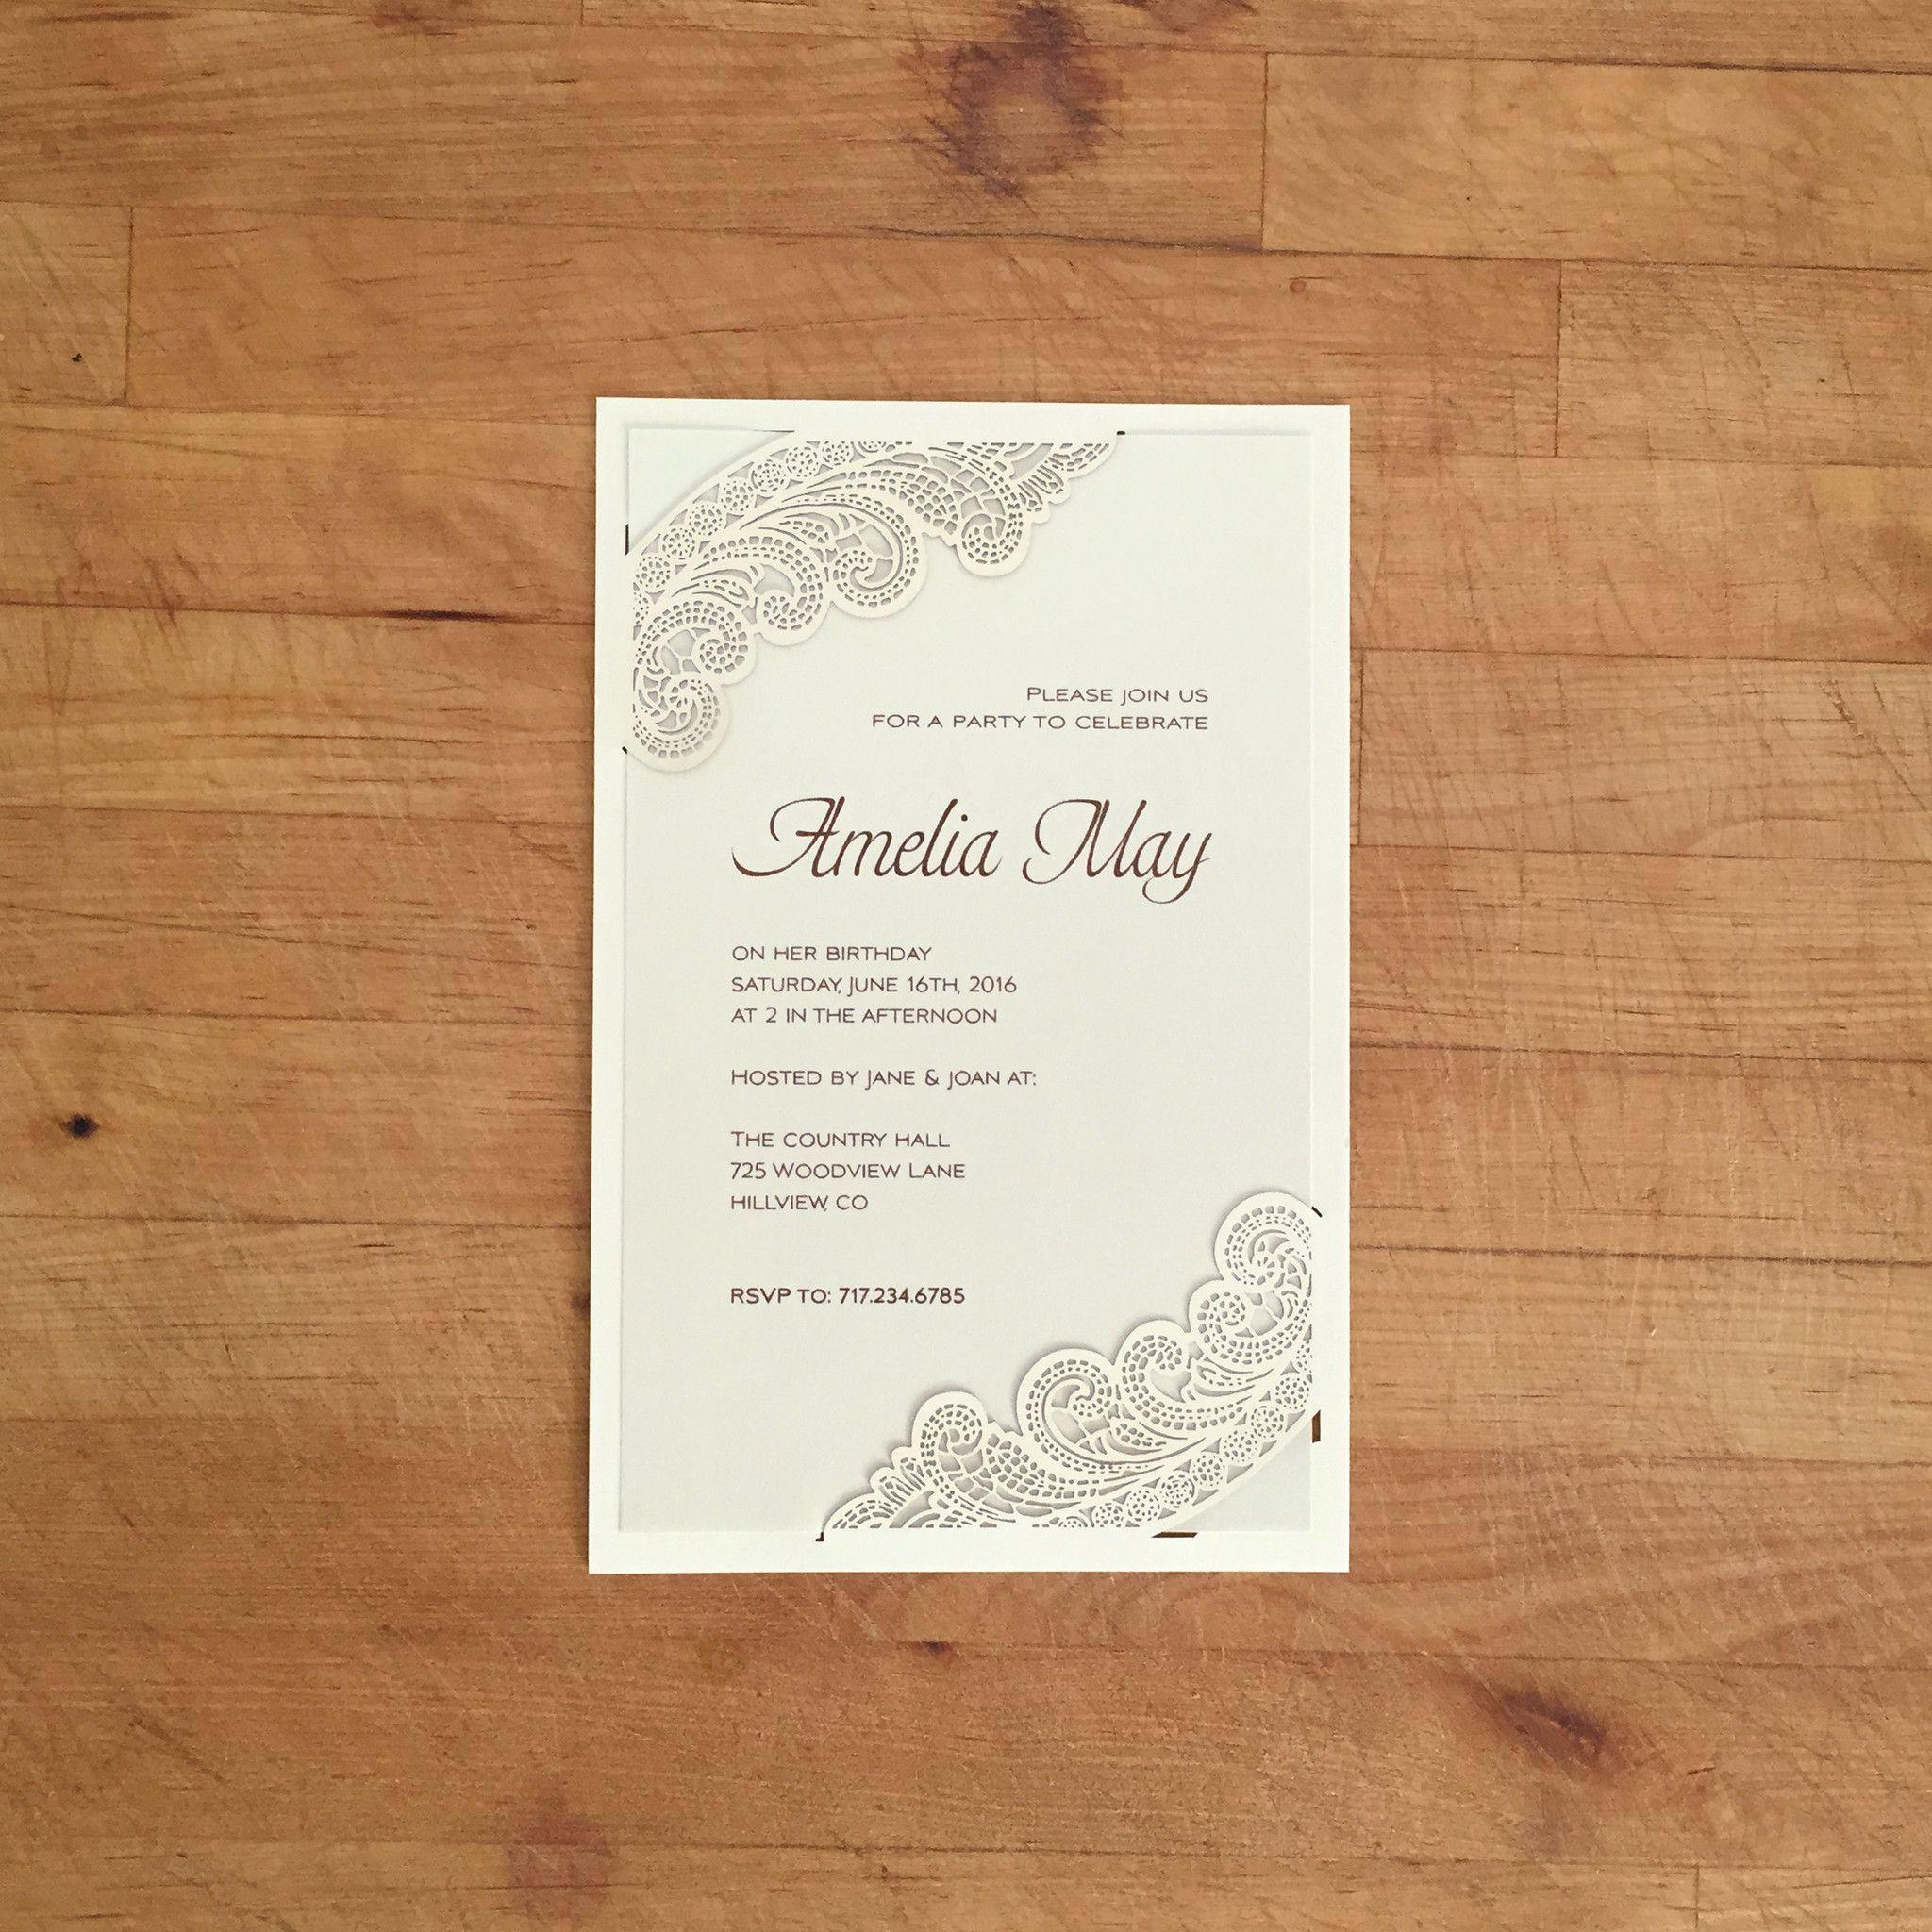 wedding invitations divas%0A Laser Cut Invitation  Chantilly Lace Corner Cut  A   Offset Printed